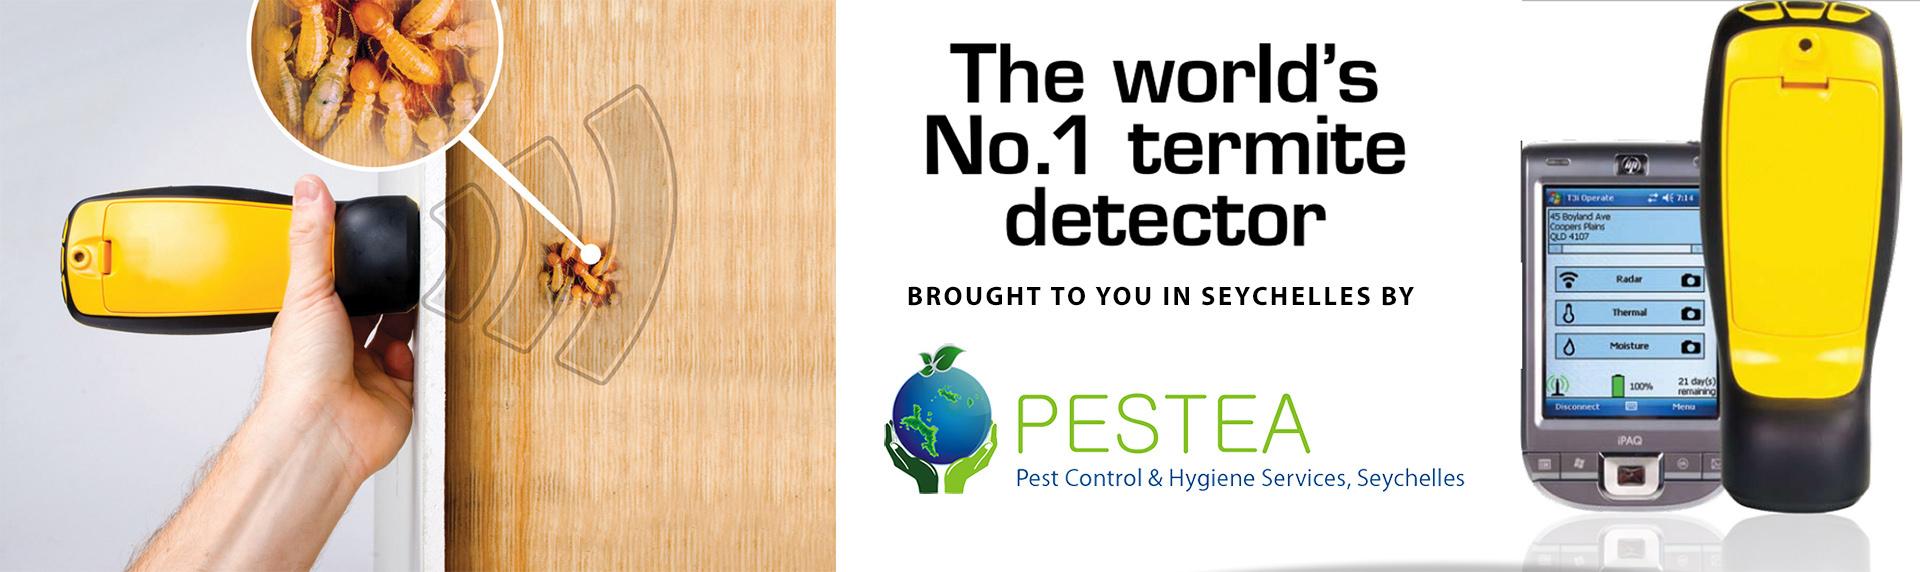 Pestea_termite_detection_in_Seychelles